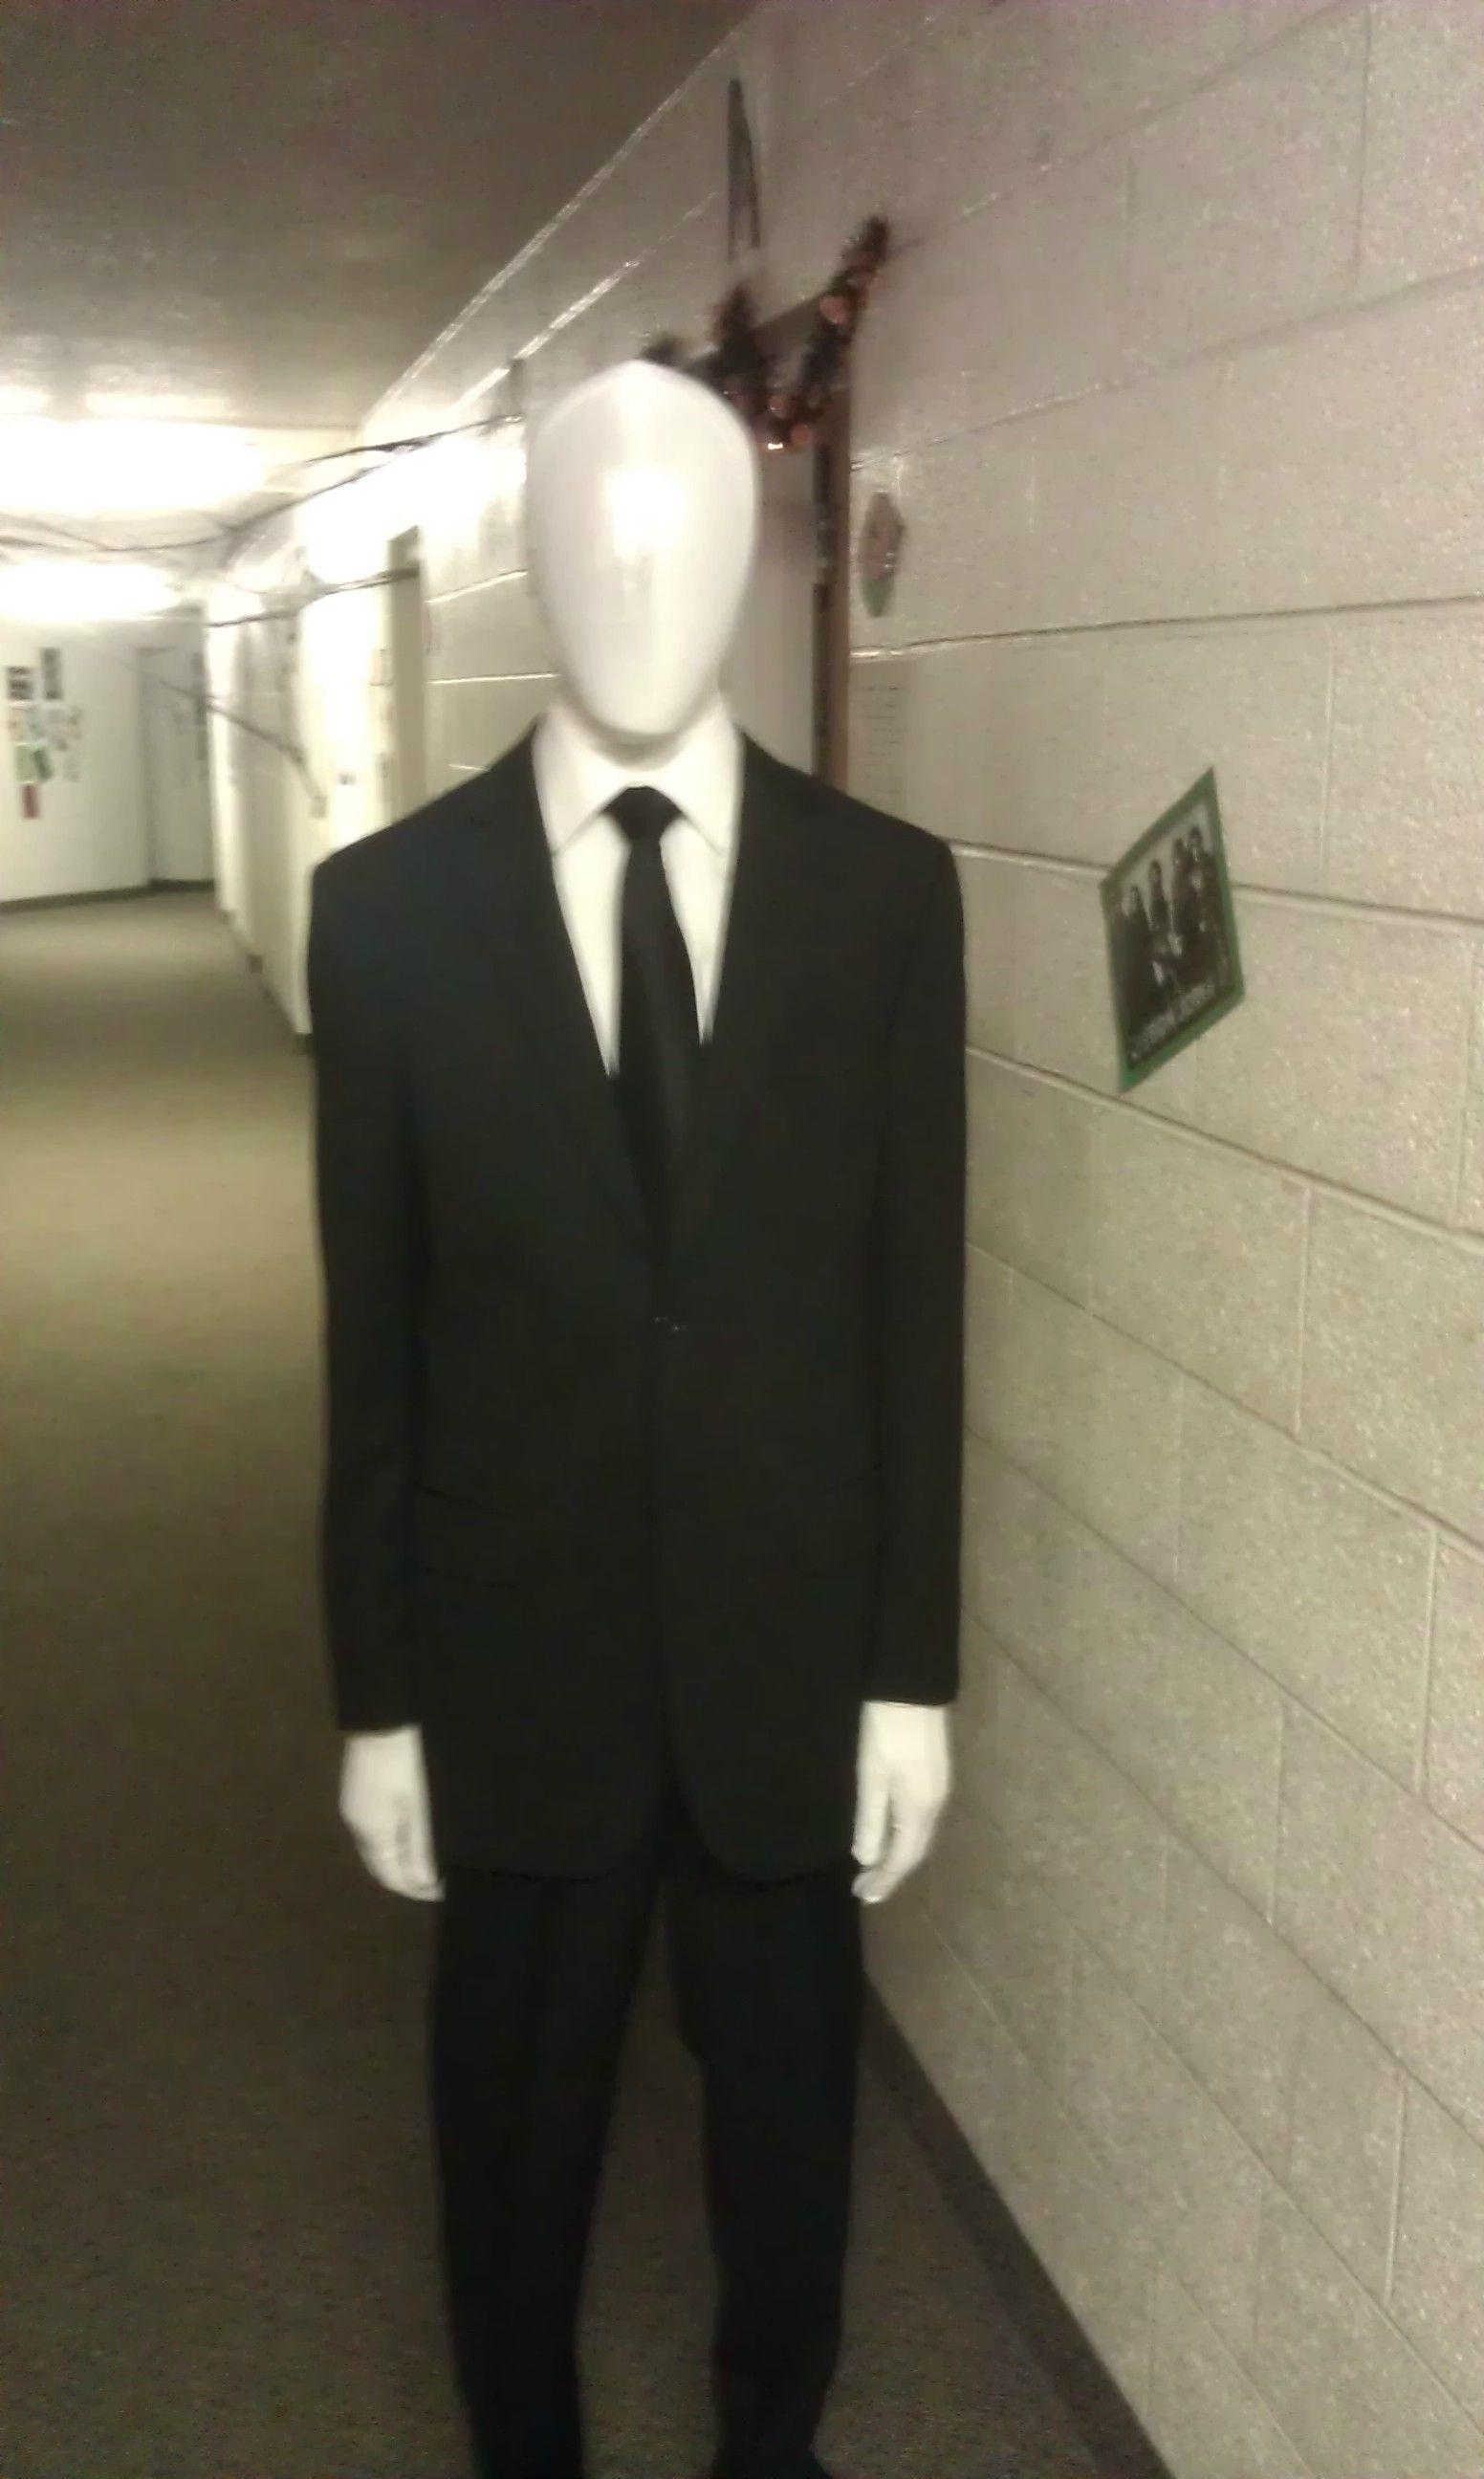 image result for slenderman costume - Halloween Costume Slender Man